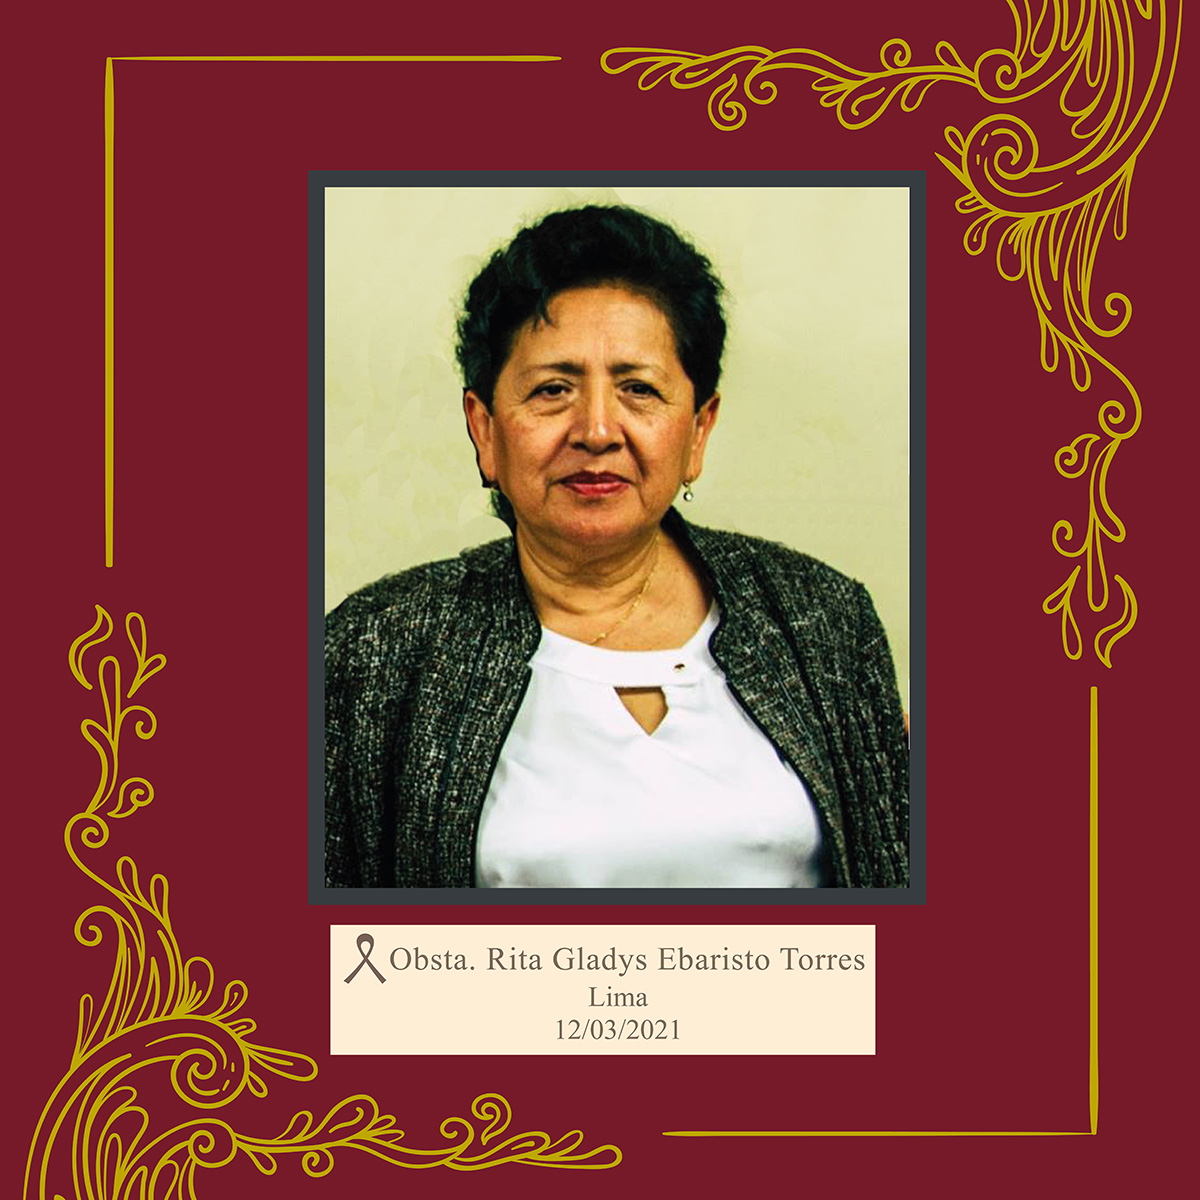 Rita Gladys Ebaristo Torres